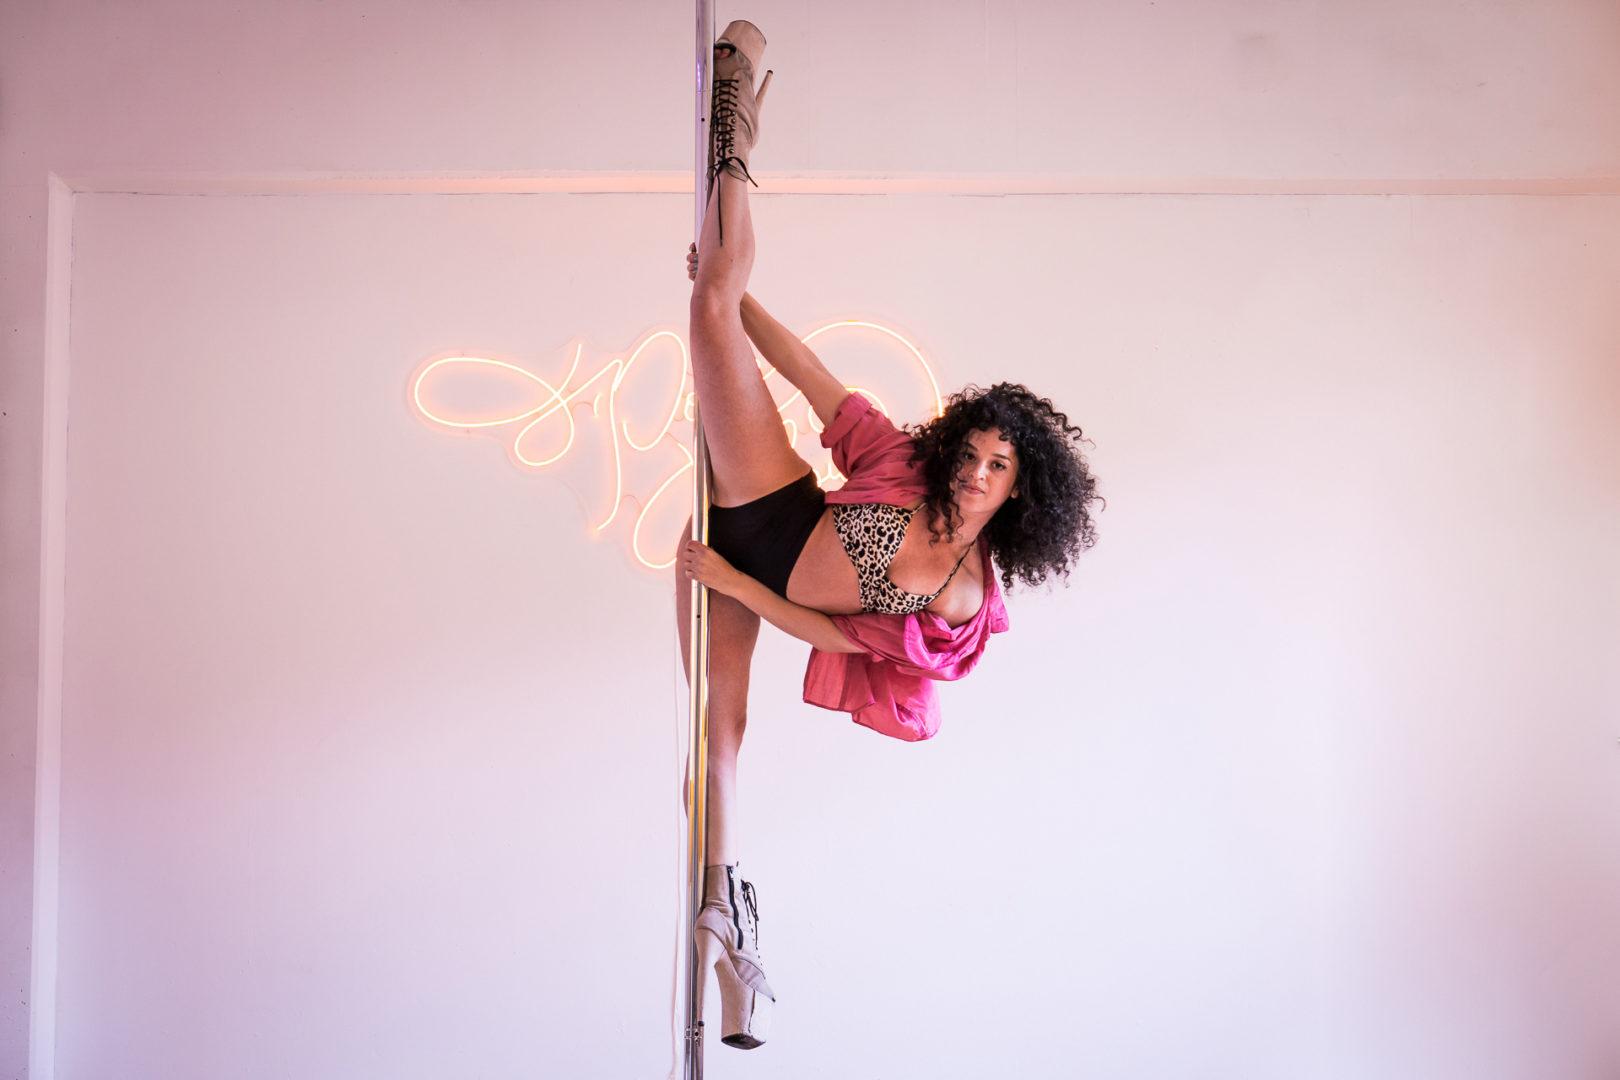 pole and flexibility classes